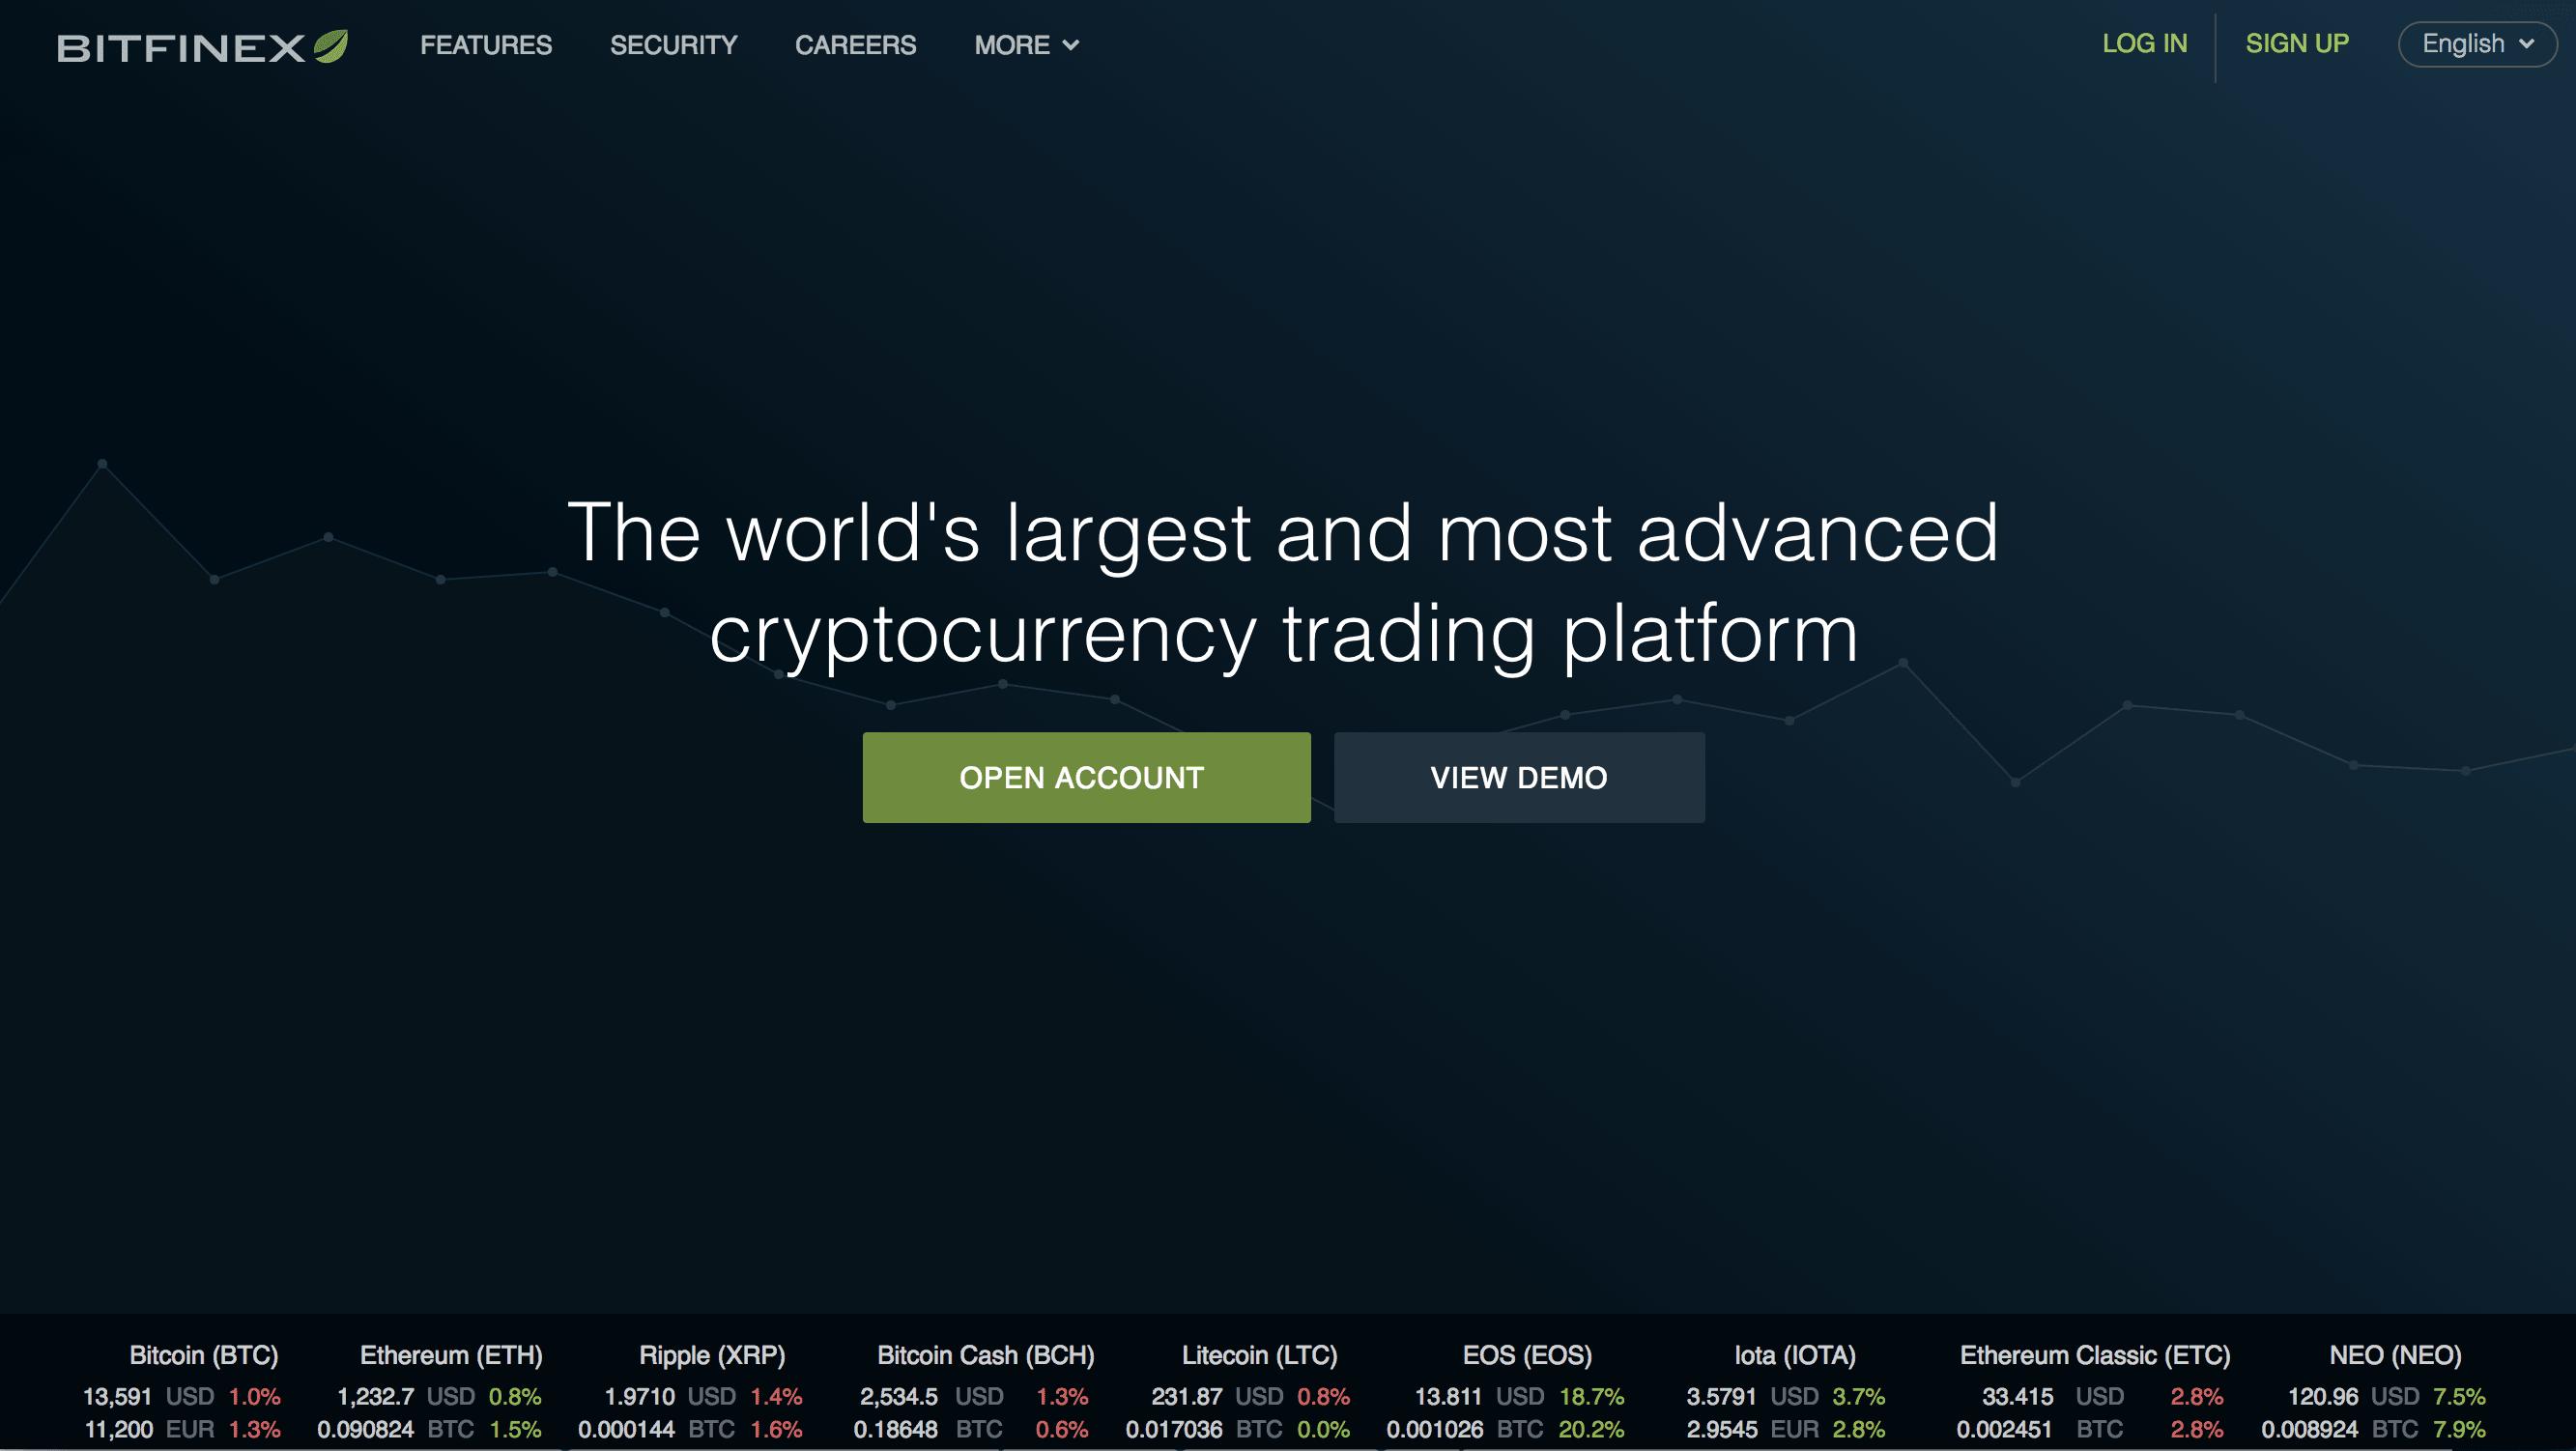 What is Bitfinex